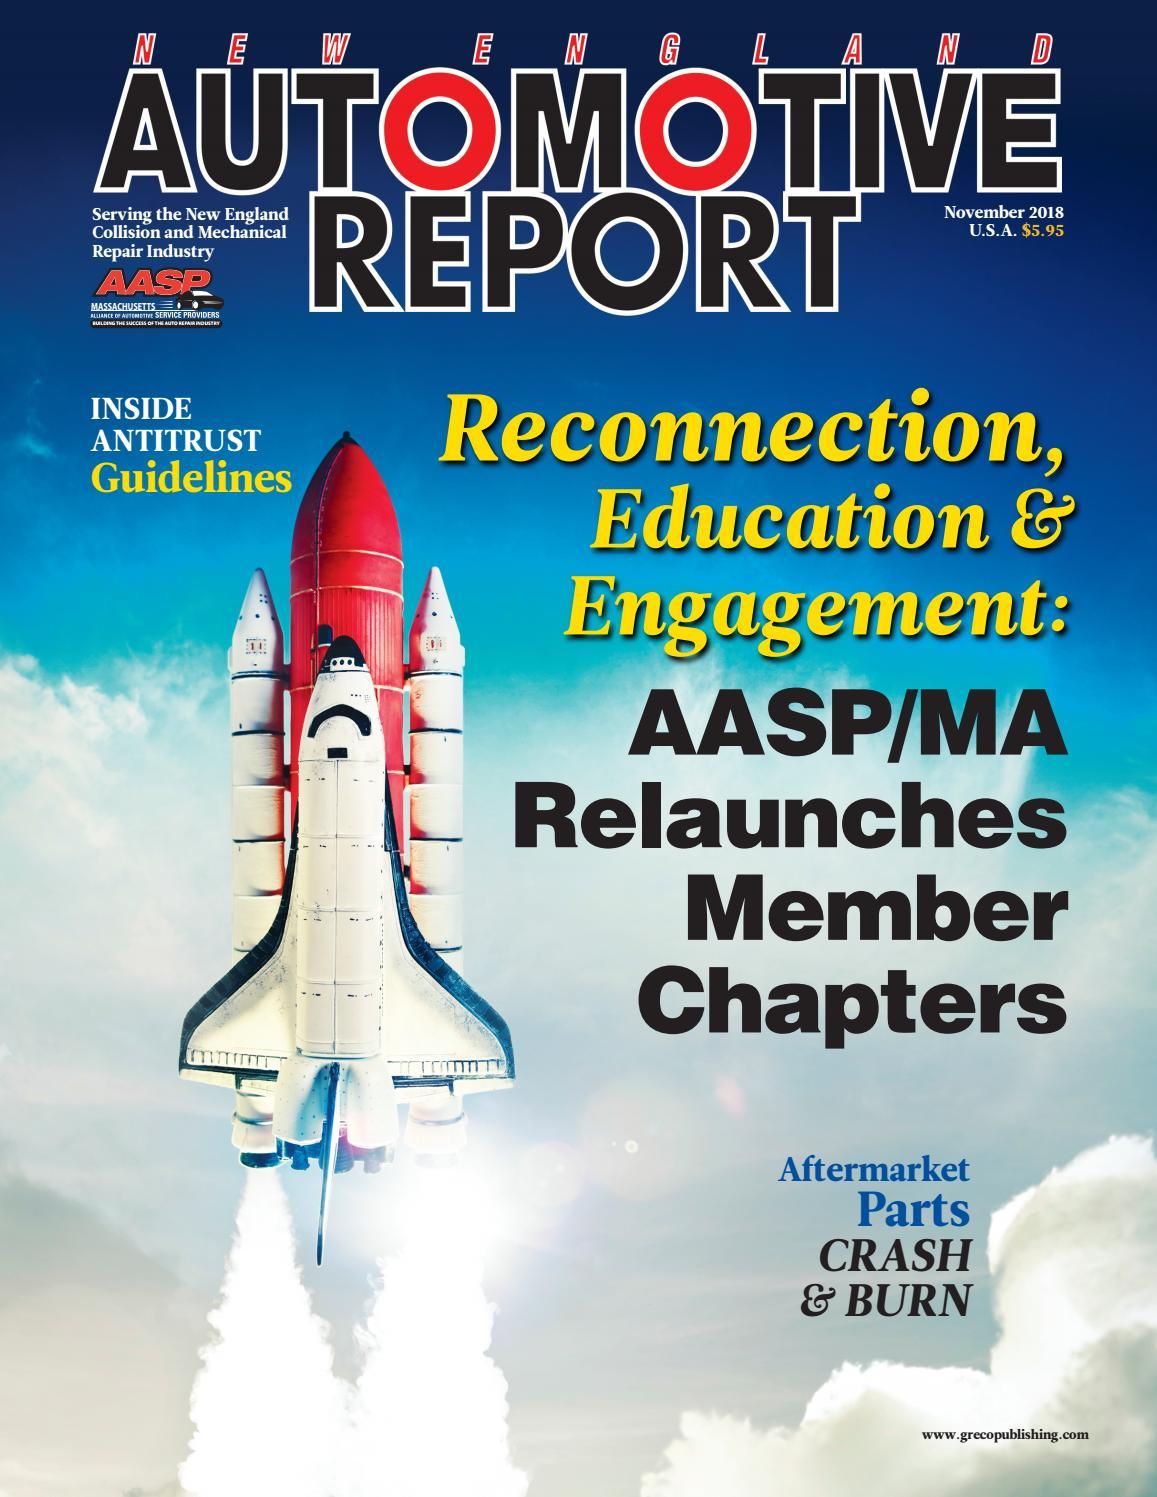 New England Automotive Report November 2018 by Thomas Greco